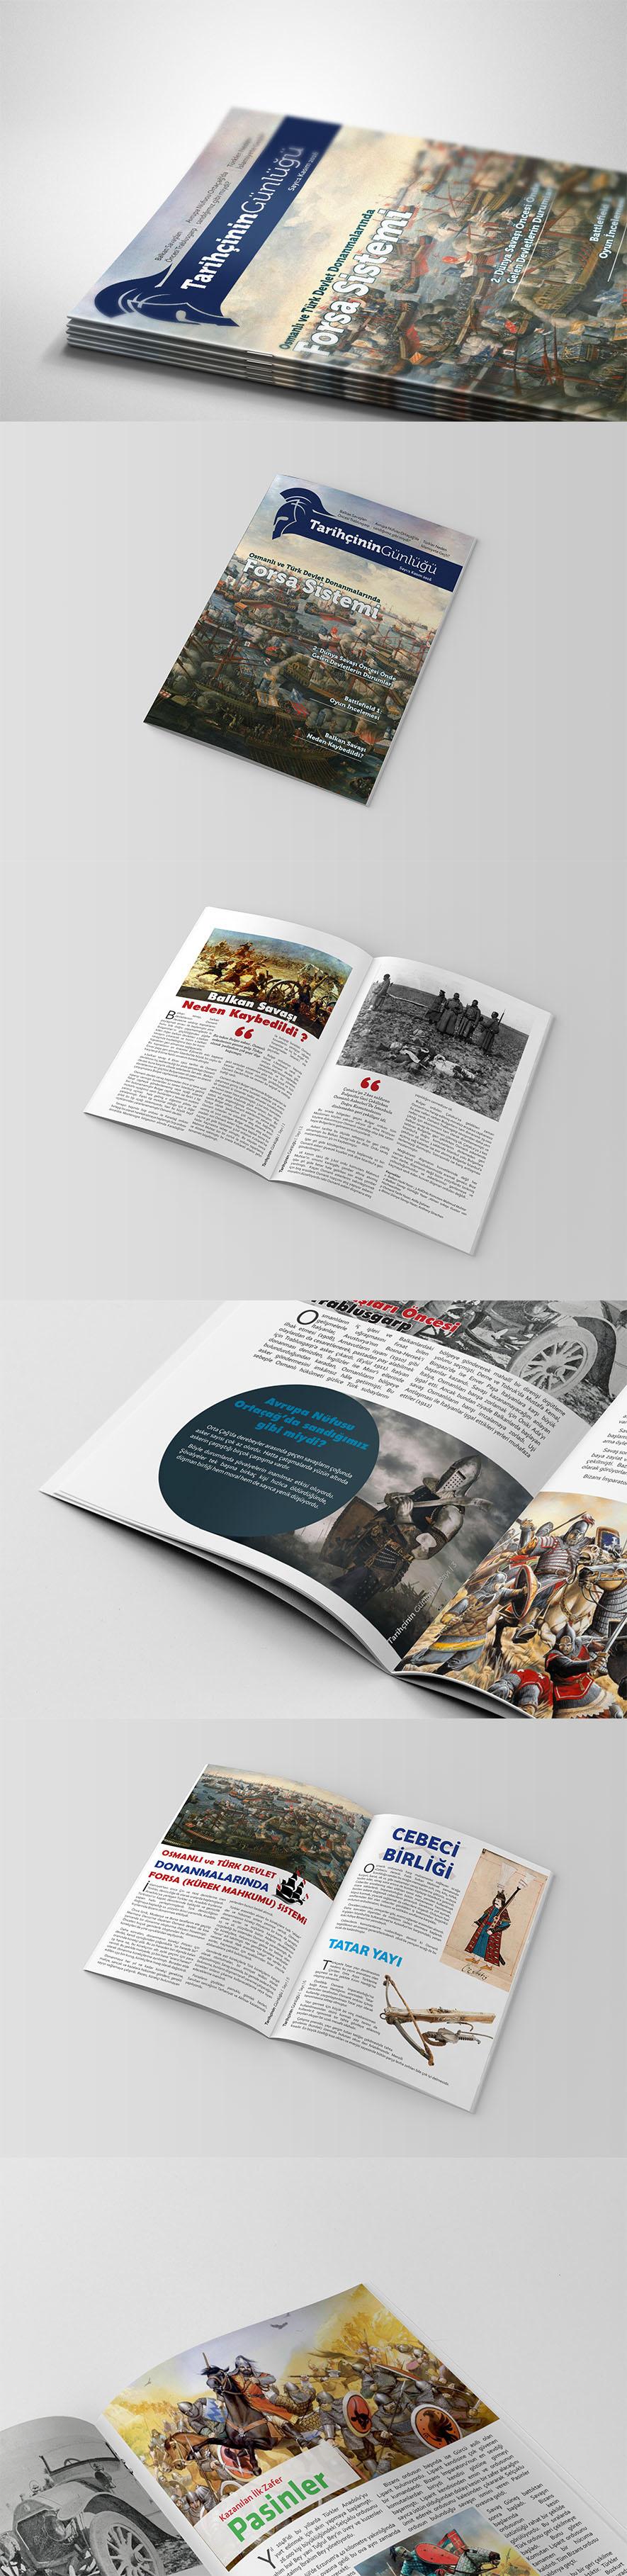 tarih magazine Dergi history periodical ottoman